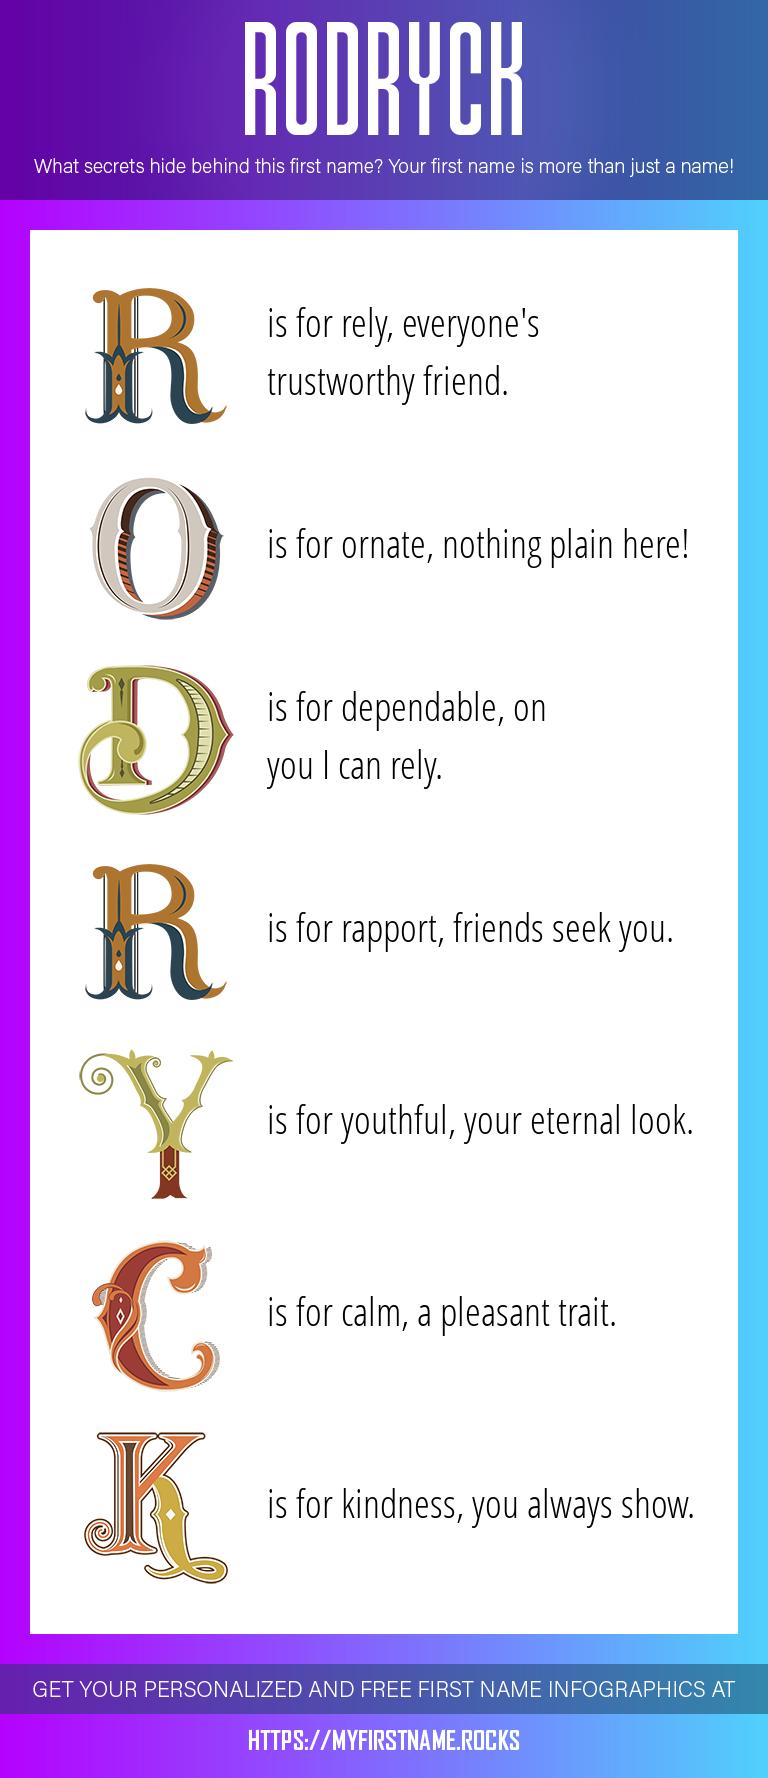 Rodryck Infographics